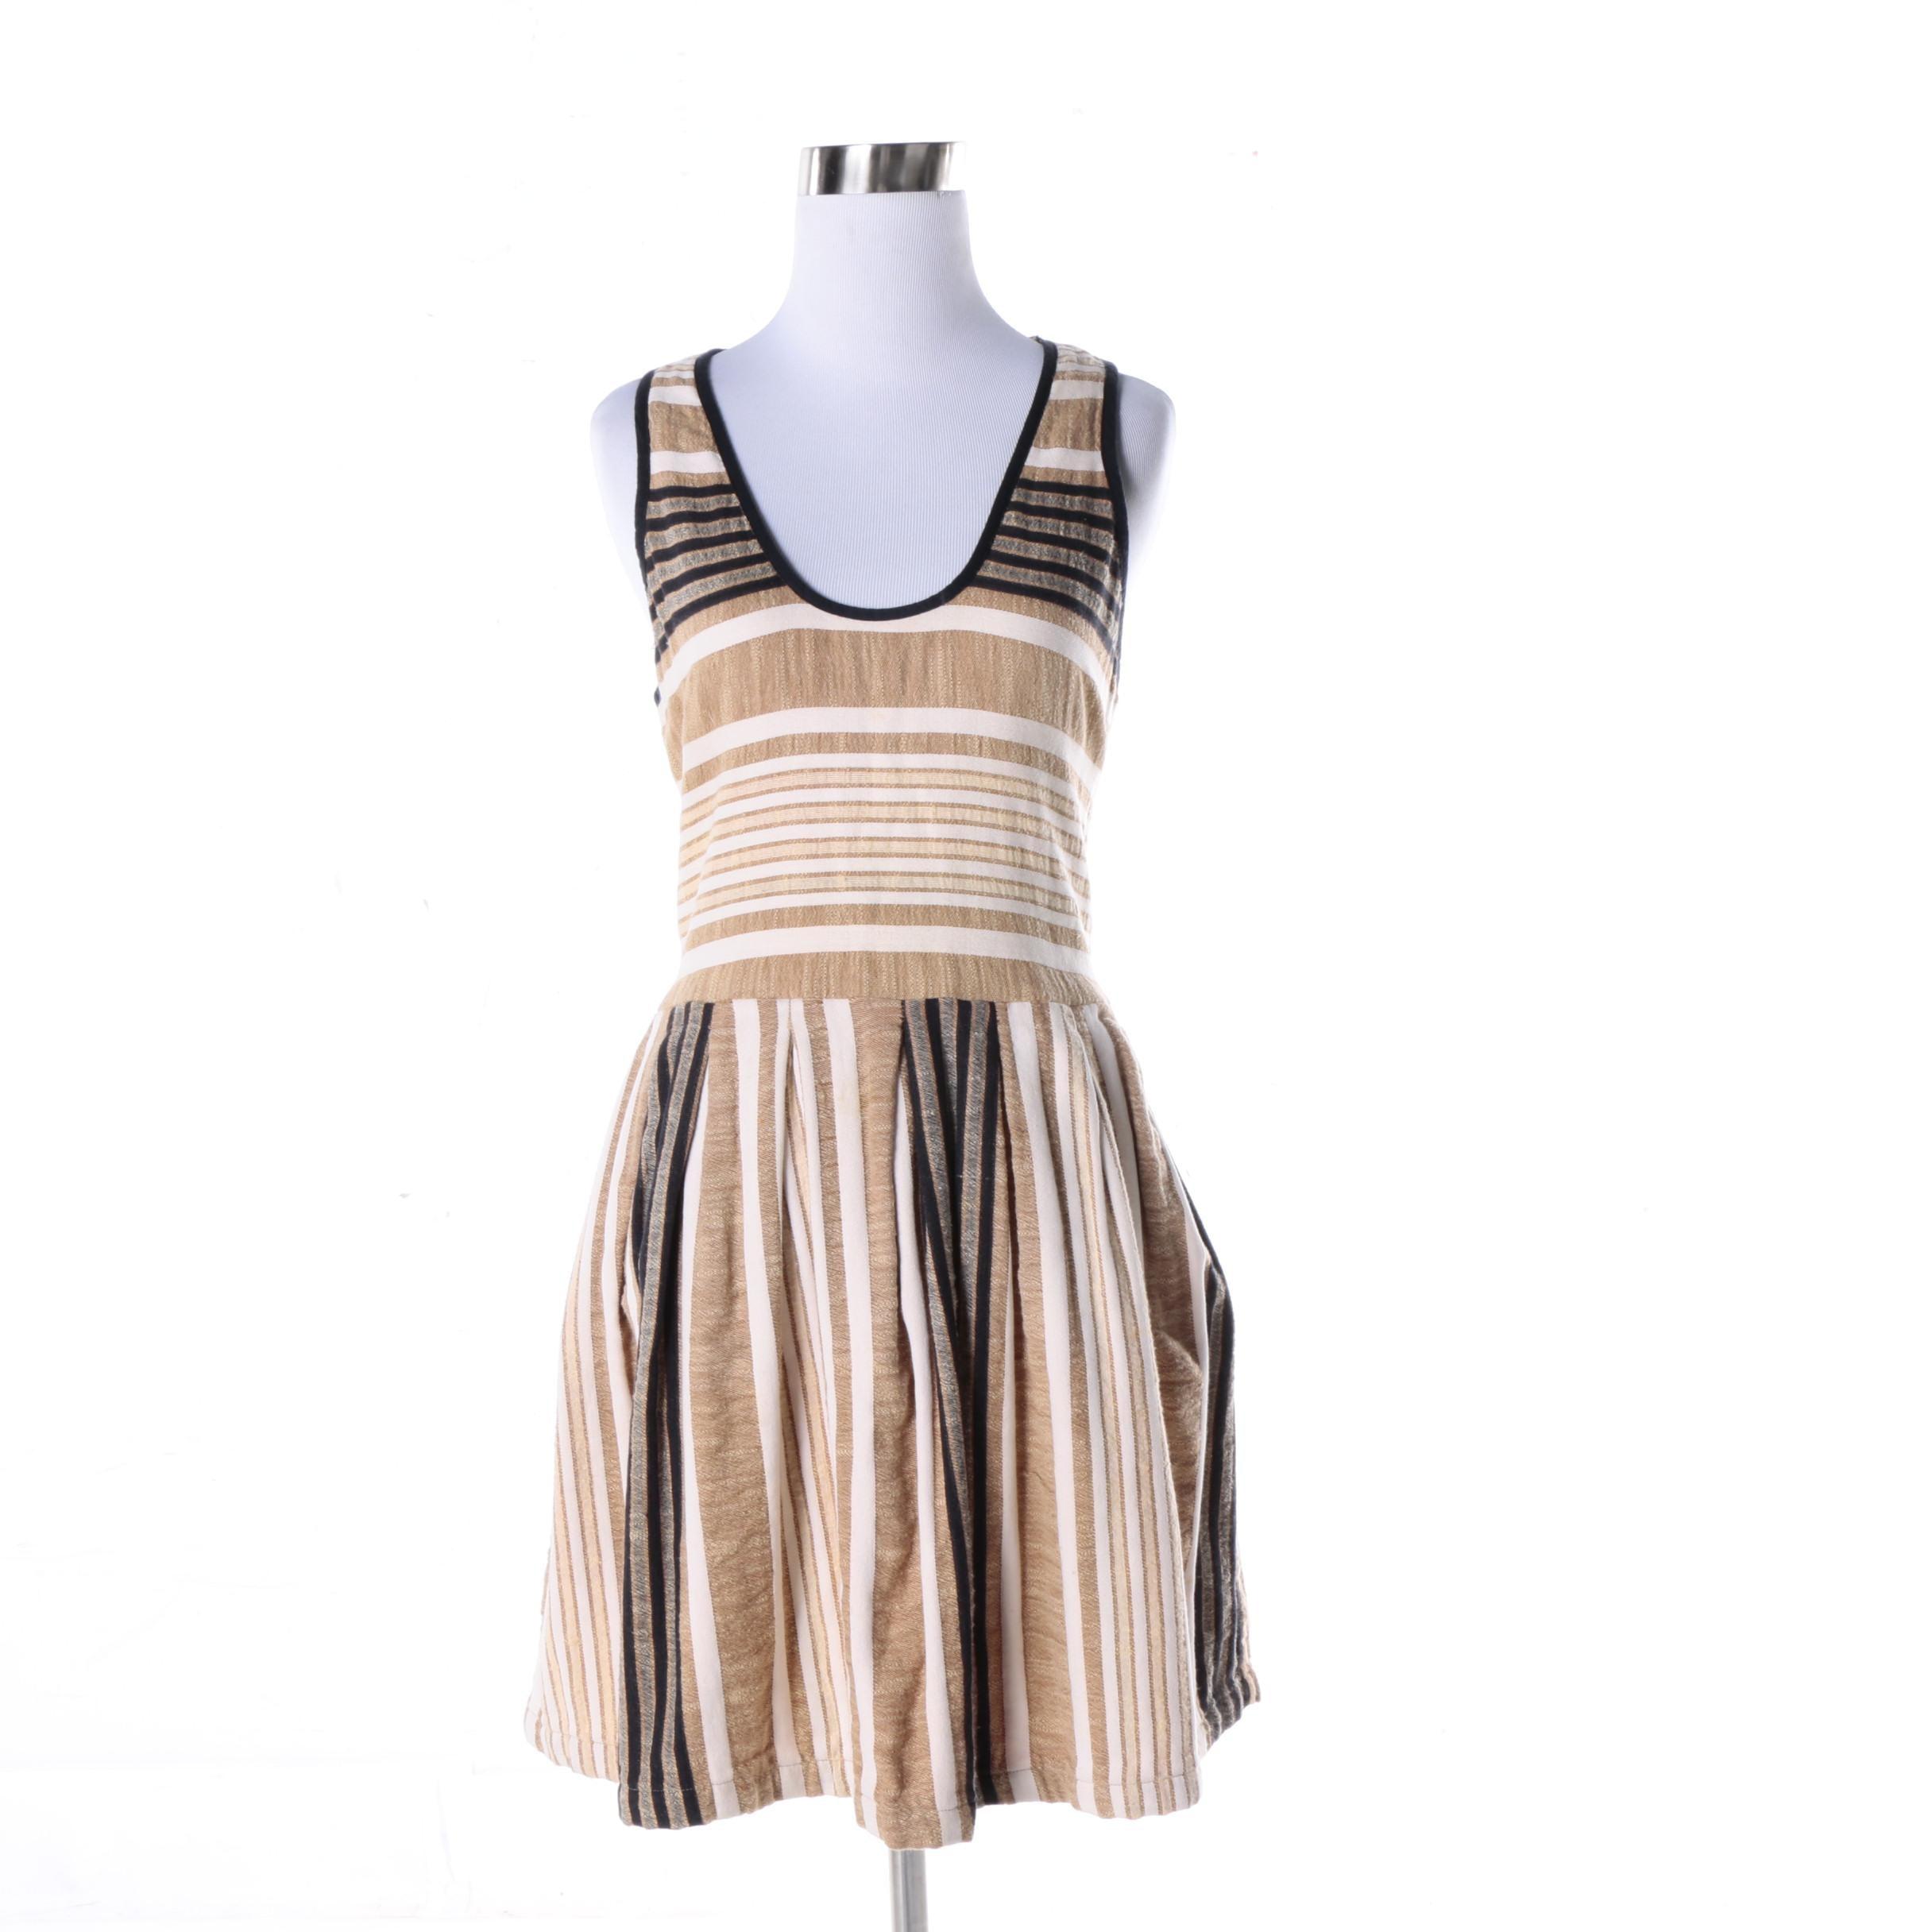 Ace & Jig Striped Sleeveless Dress